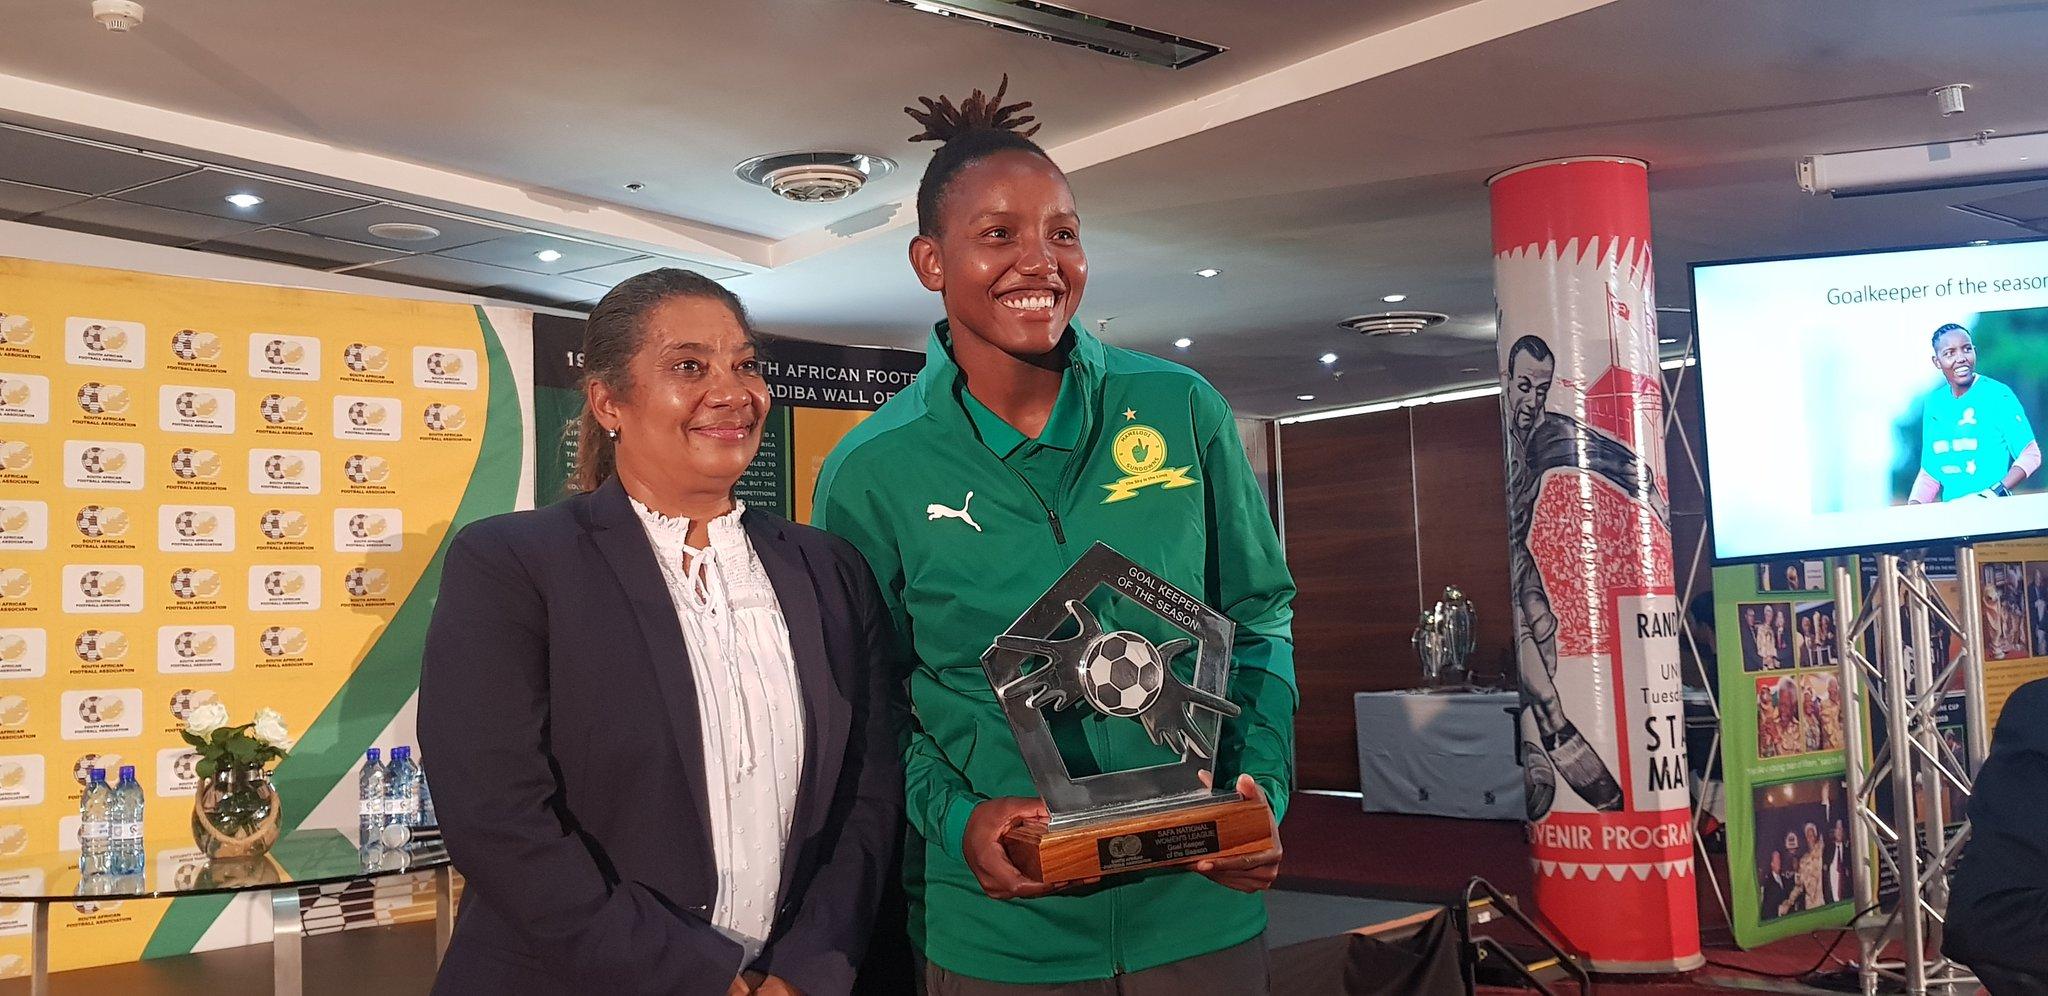 2019/20 Goalkeeper of the Season: Masandawana's Andile Dlamini